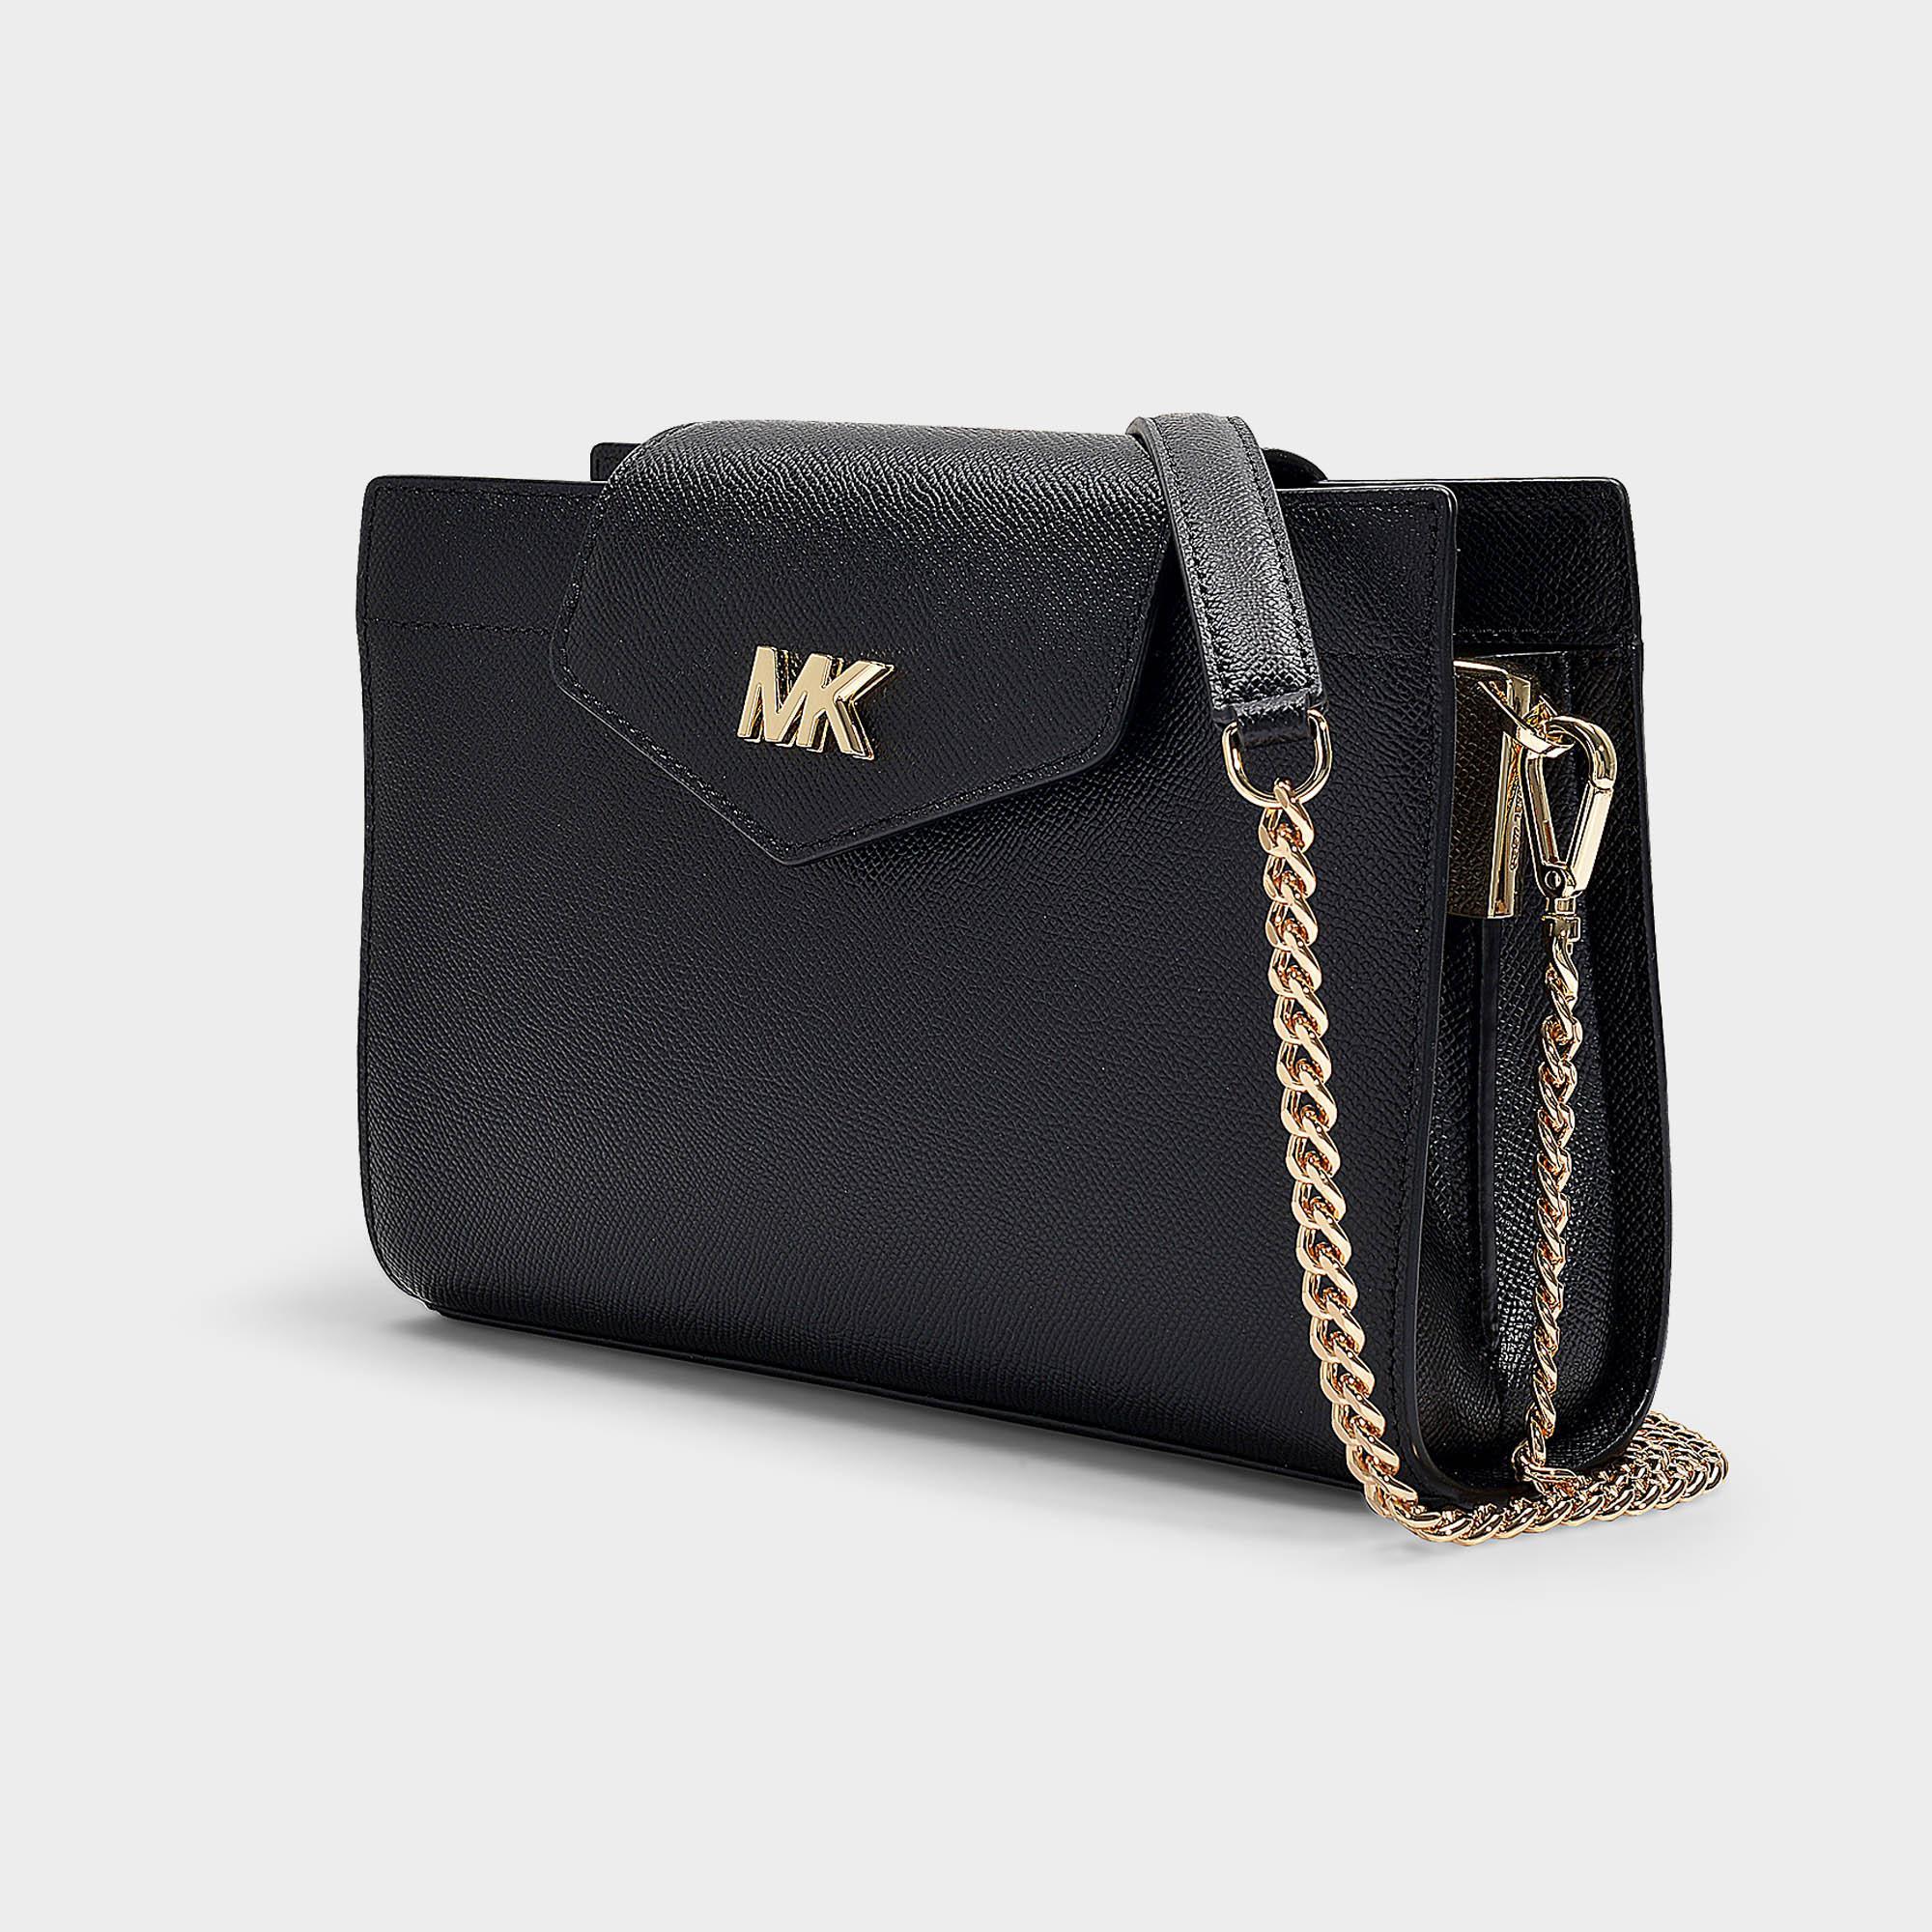 11b659bd91f101 MICHAEL Michael Kors - Crossbodies Large Convertible Crossbody Clutch Bag  In Black Grained Calfskin - Lyst. View fullscreen